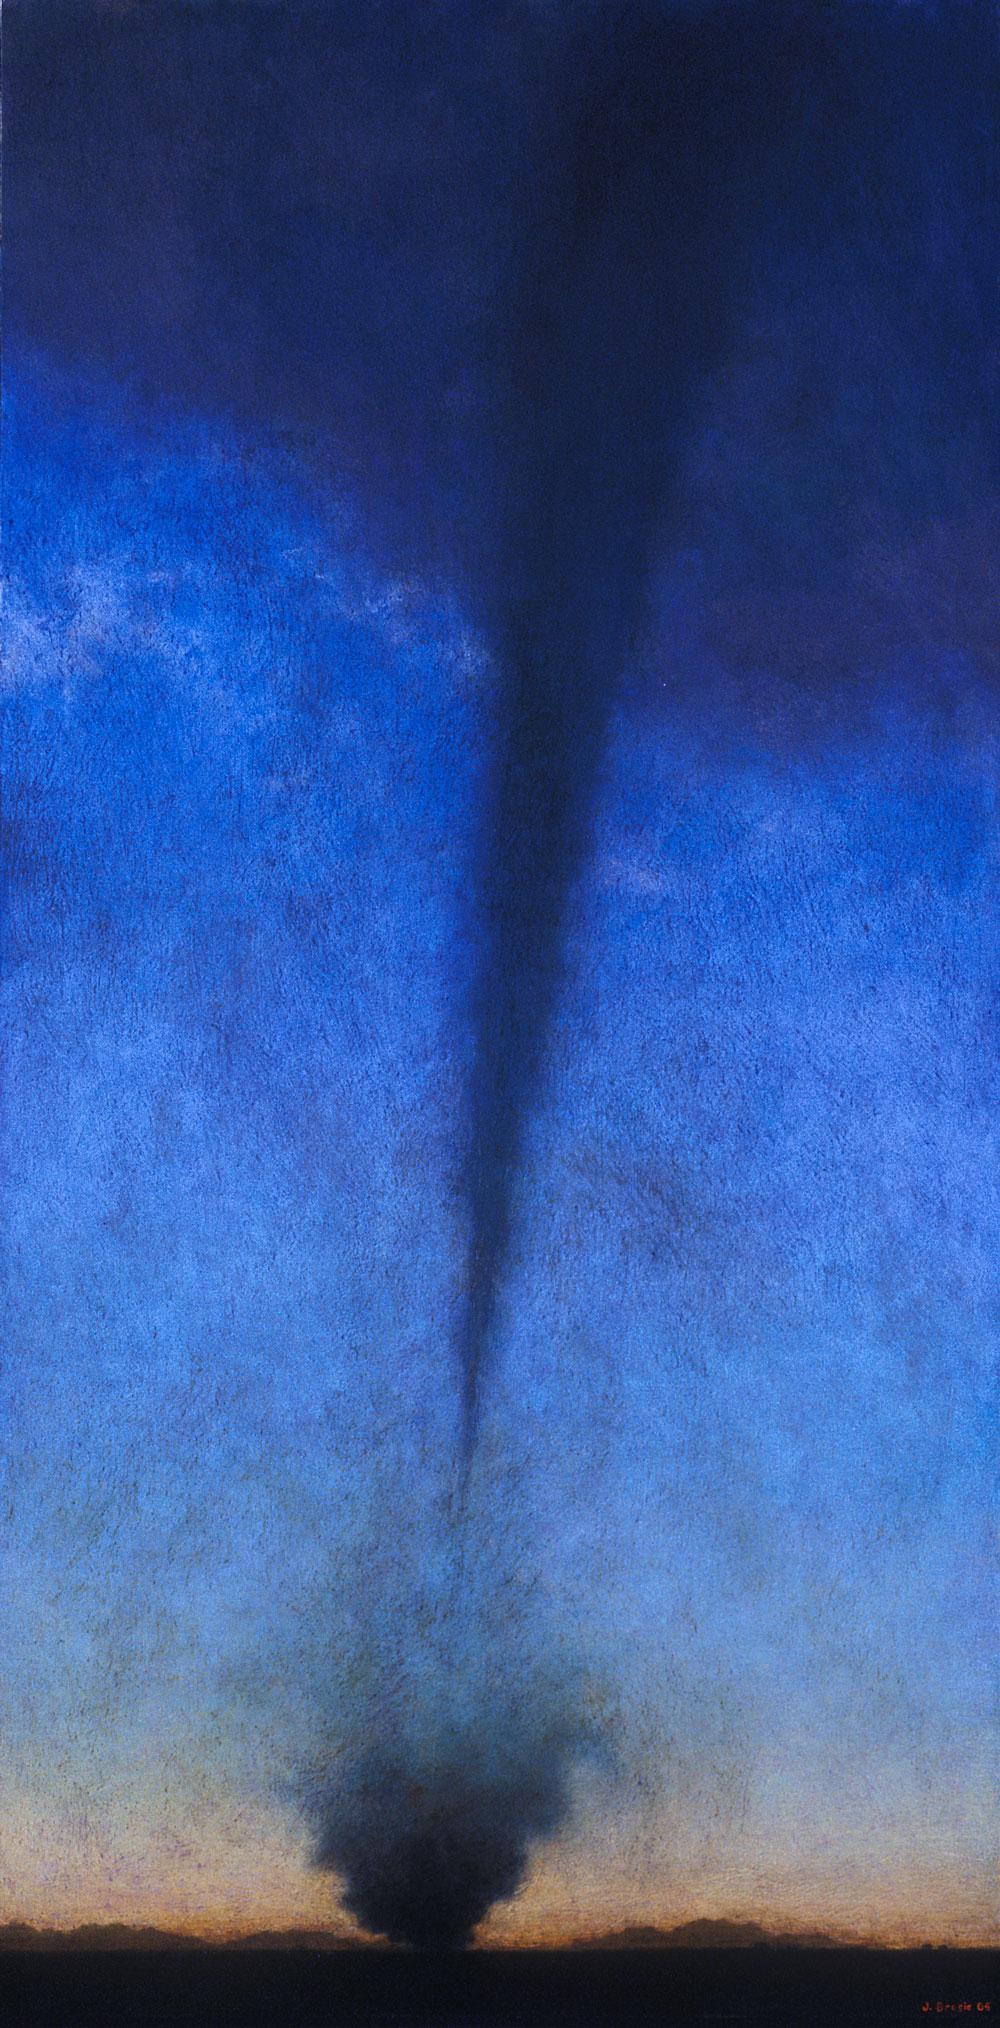 Twilight, 48 x 24, oil on canvas, 2005